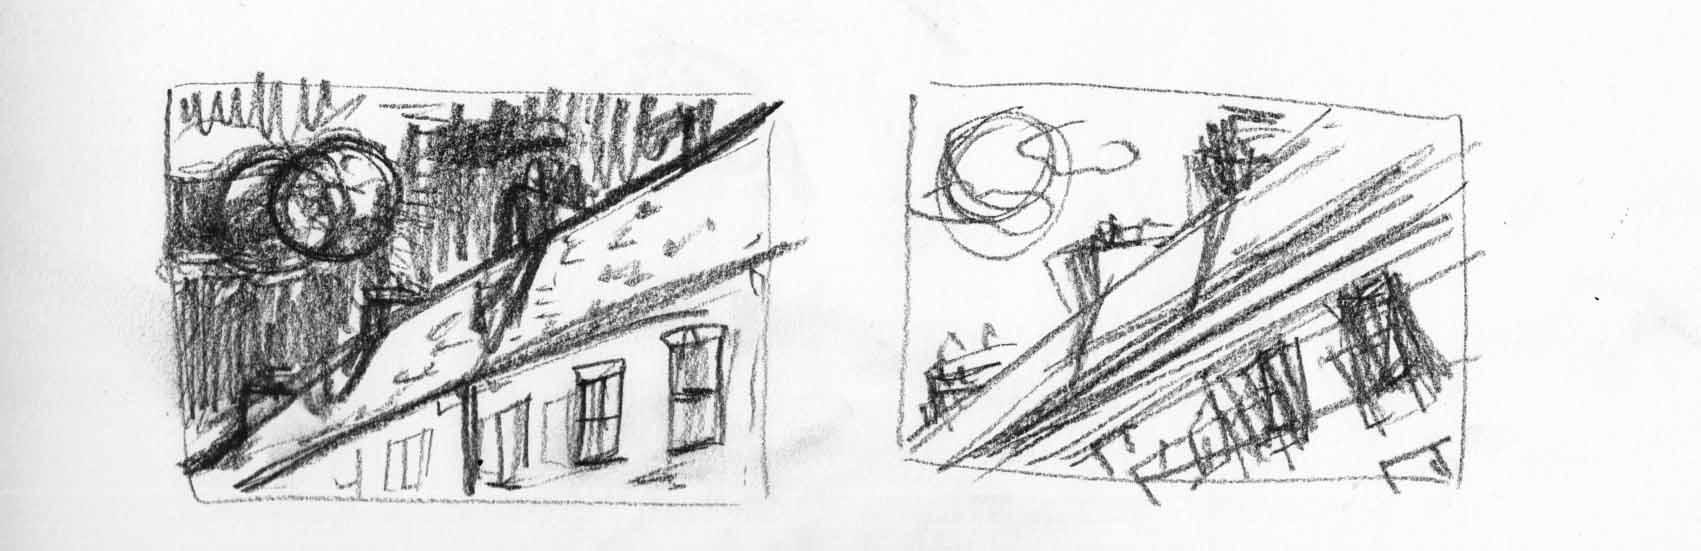 p-4-sketches-9-23